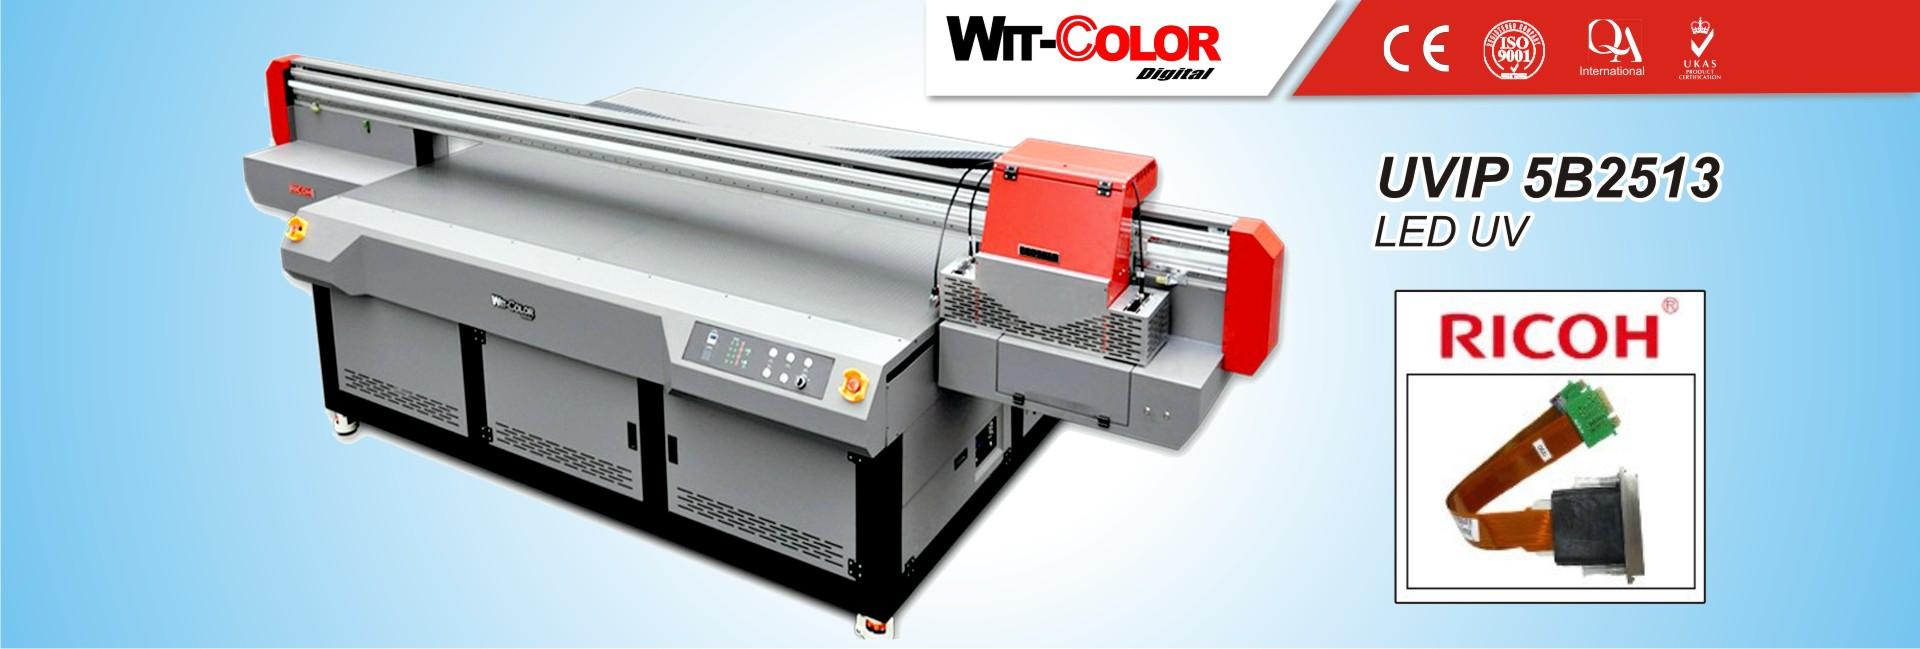 Diksha Infotech Consultancy Services Flex Printing Machine